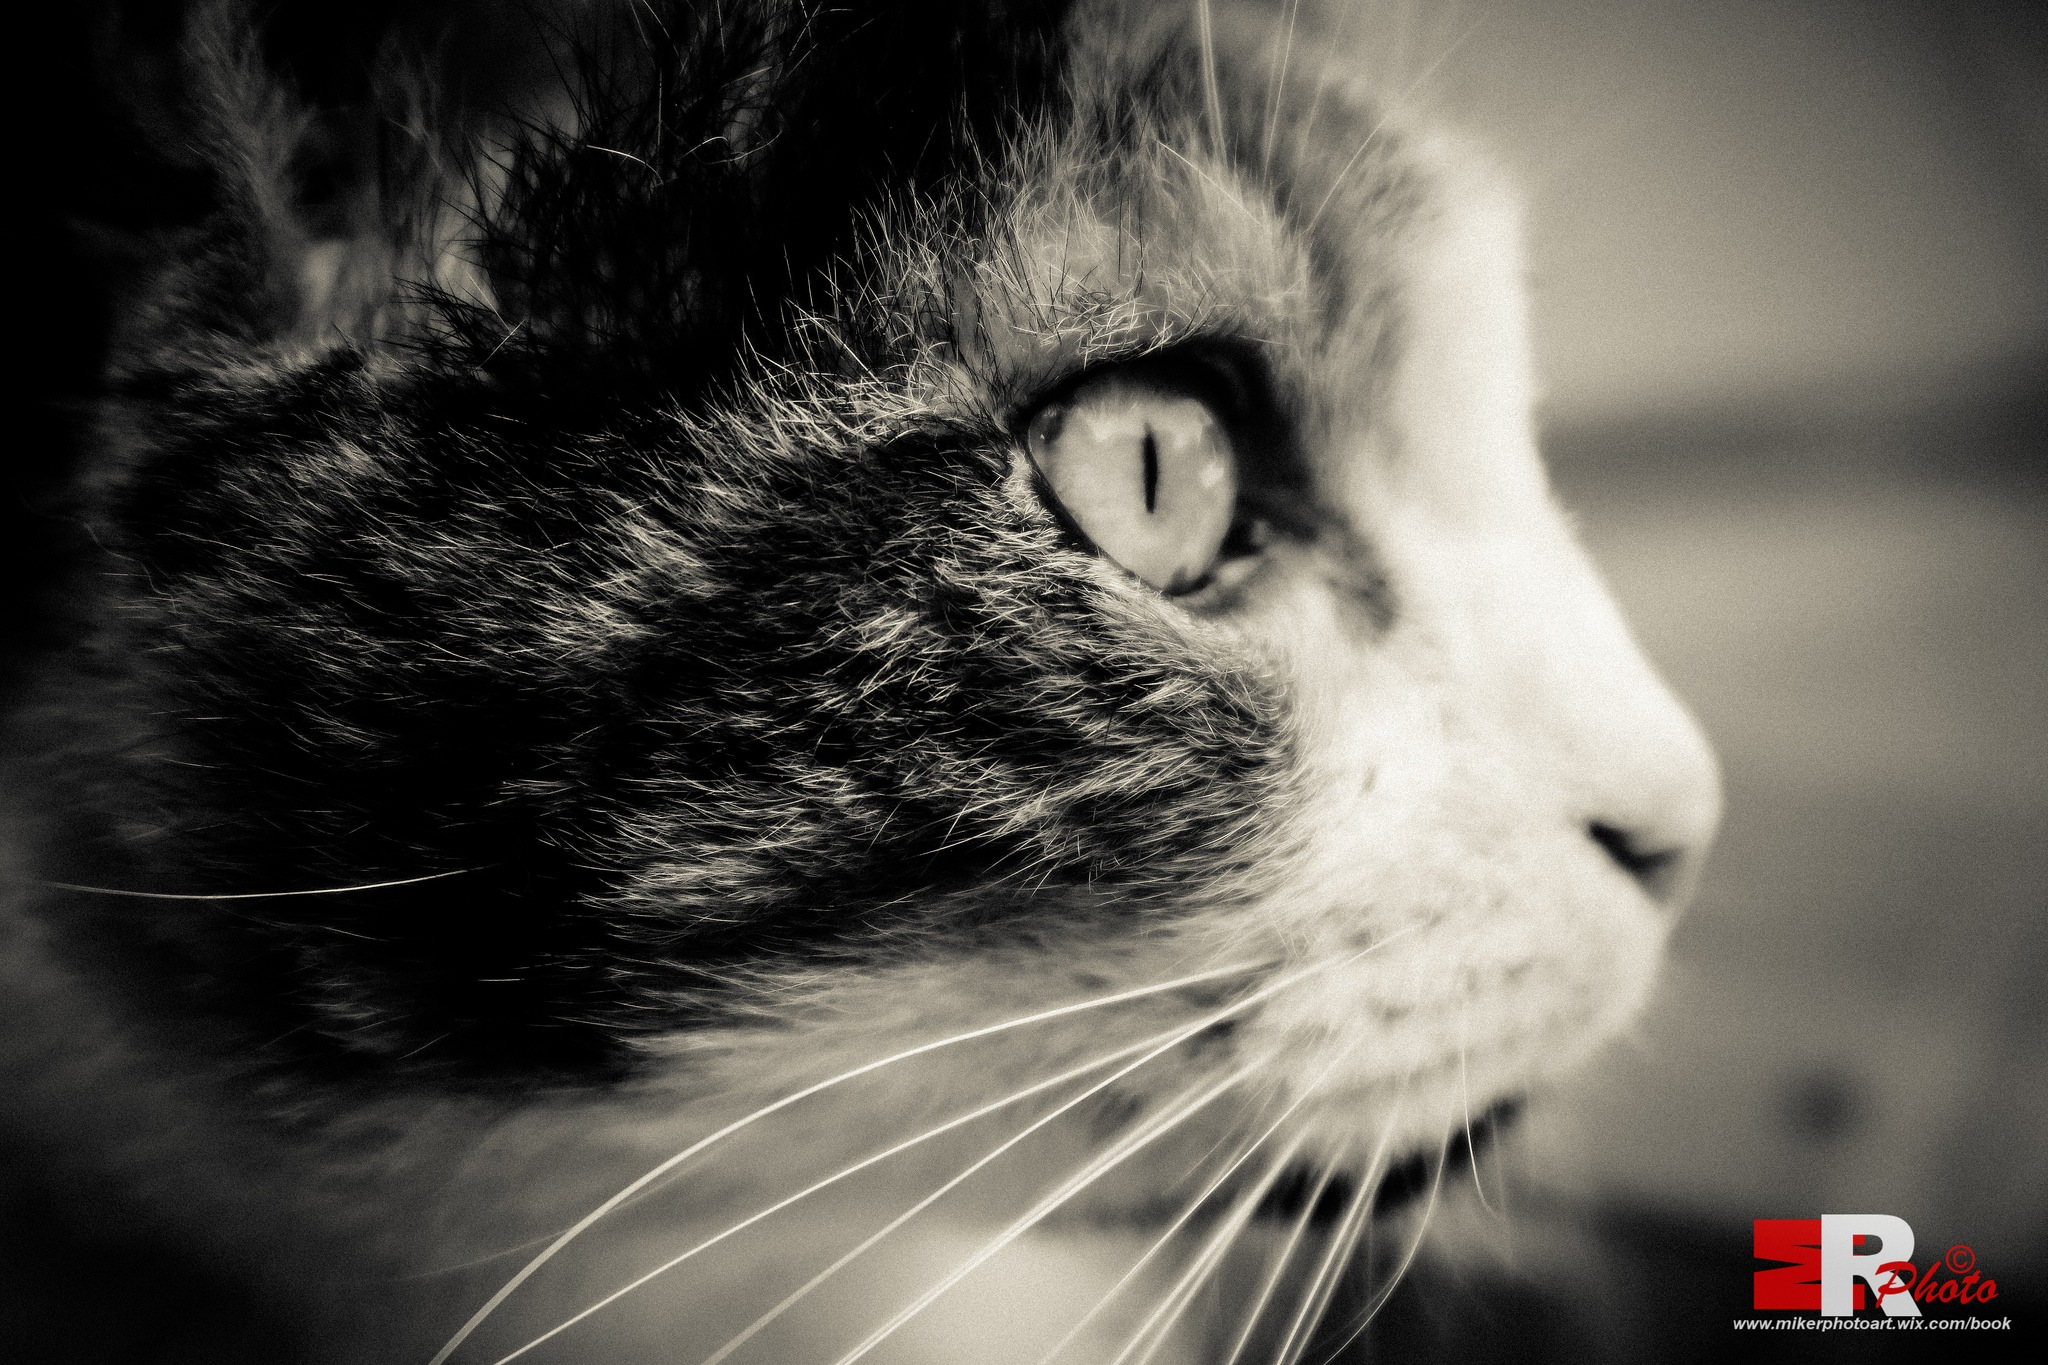 She, the Cat. by Michele Rallo | MR PhotoArt ©